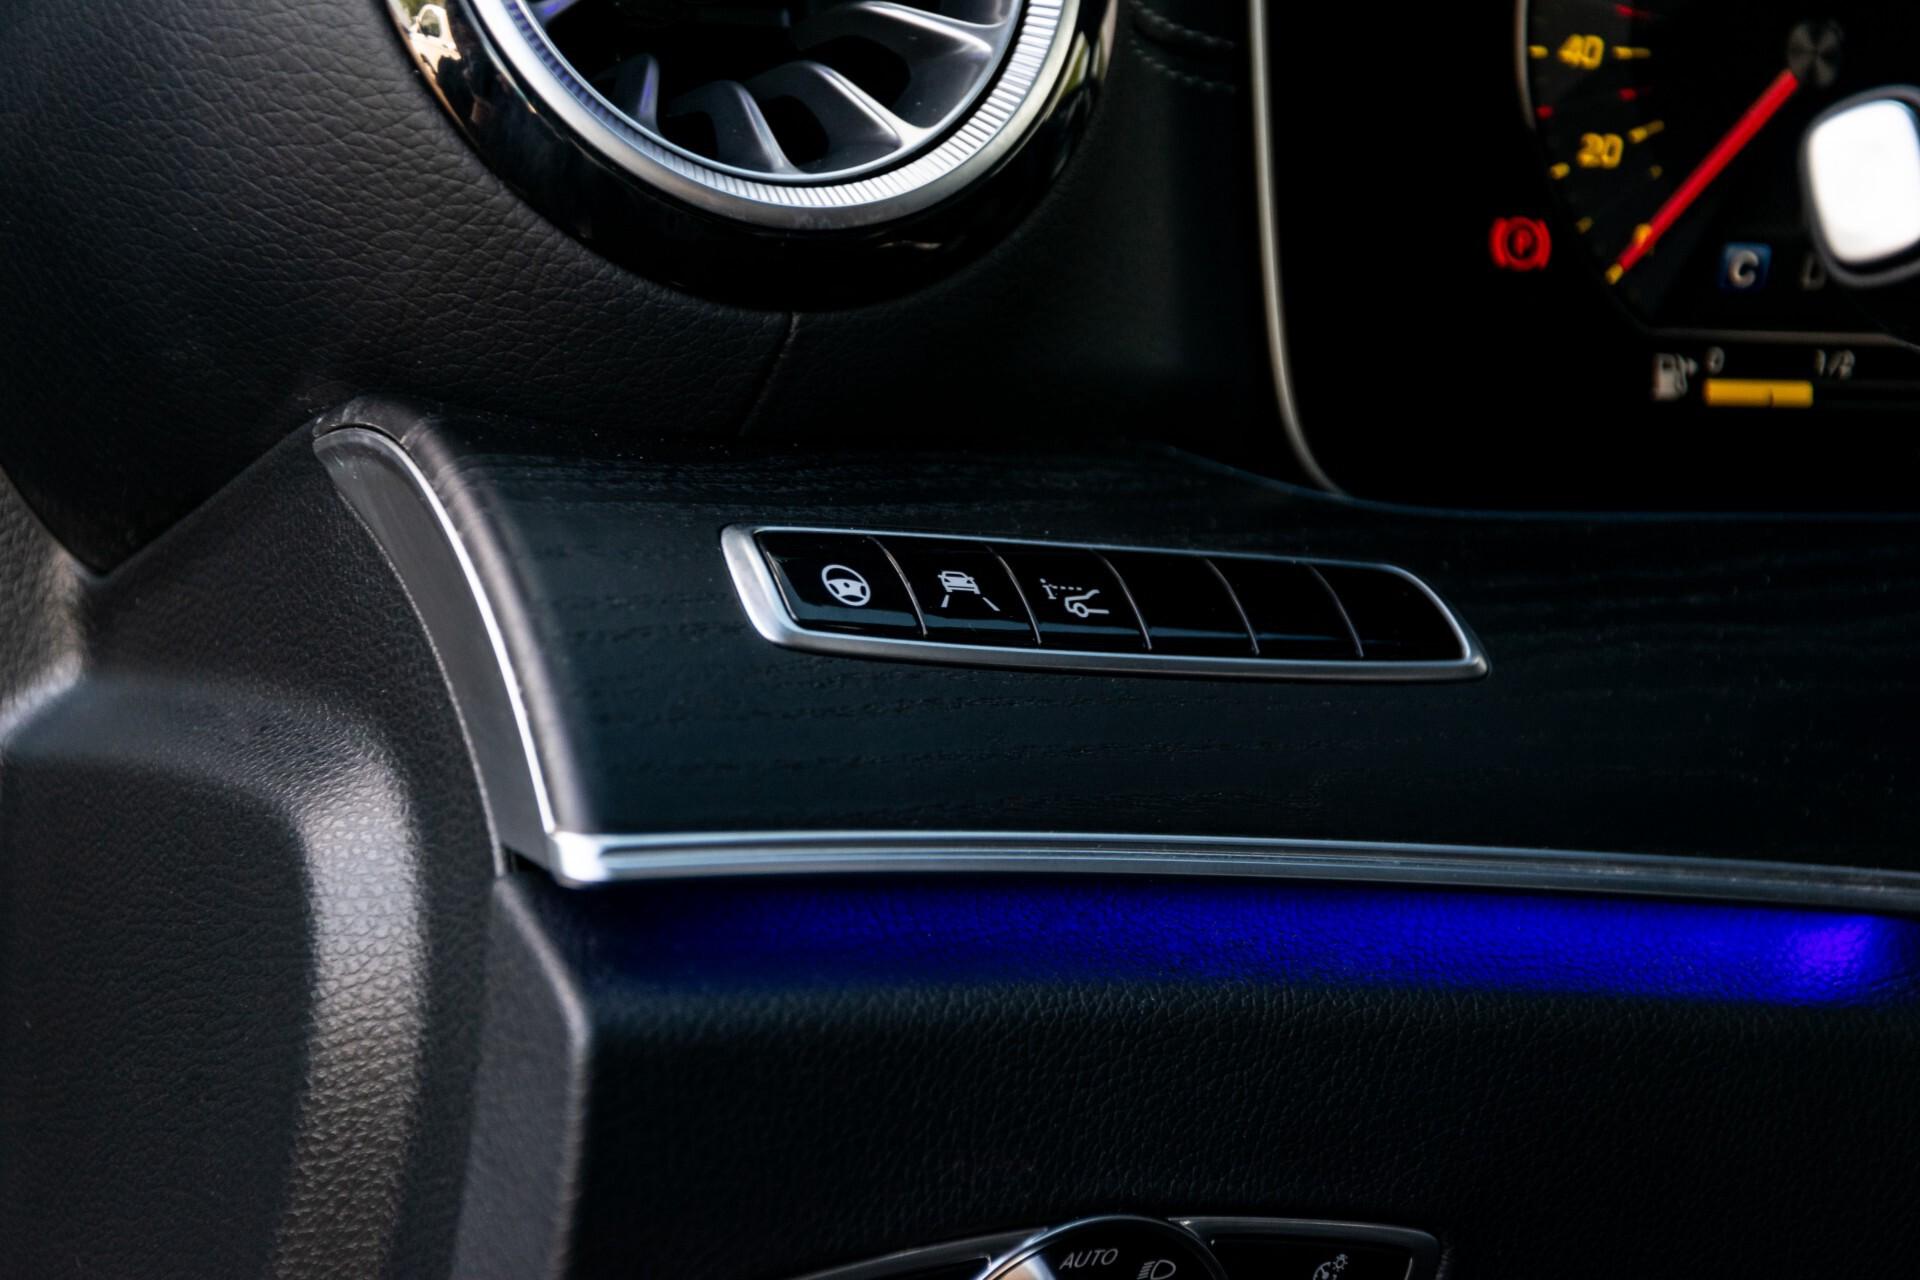 Mercedes-Benz E-Klasse Coupé 300 AMG Panorama/Rij-assist/Keyless/Massage/Memory/HUD/Standkachel/Night Aut9 Foto 42